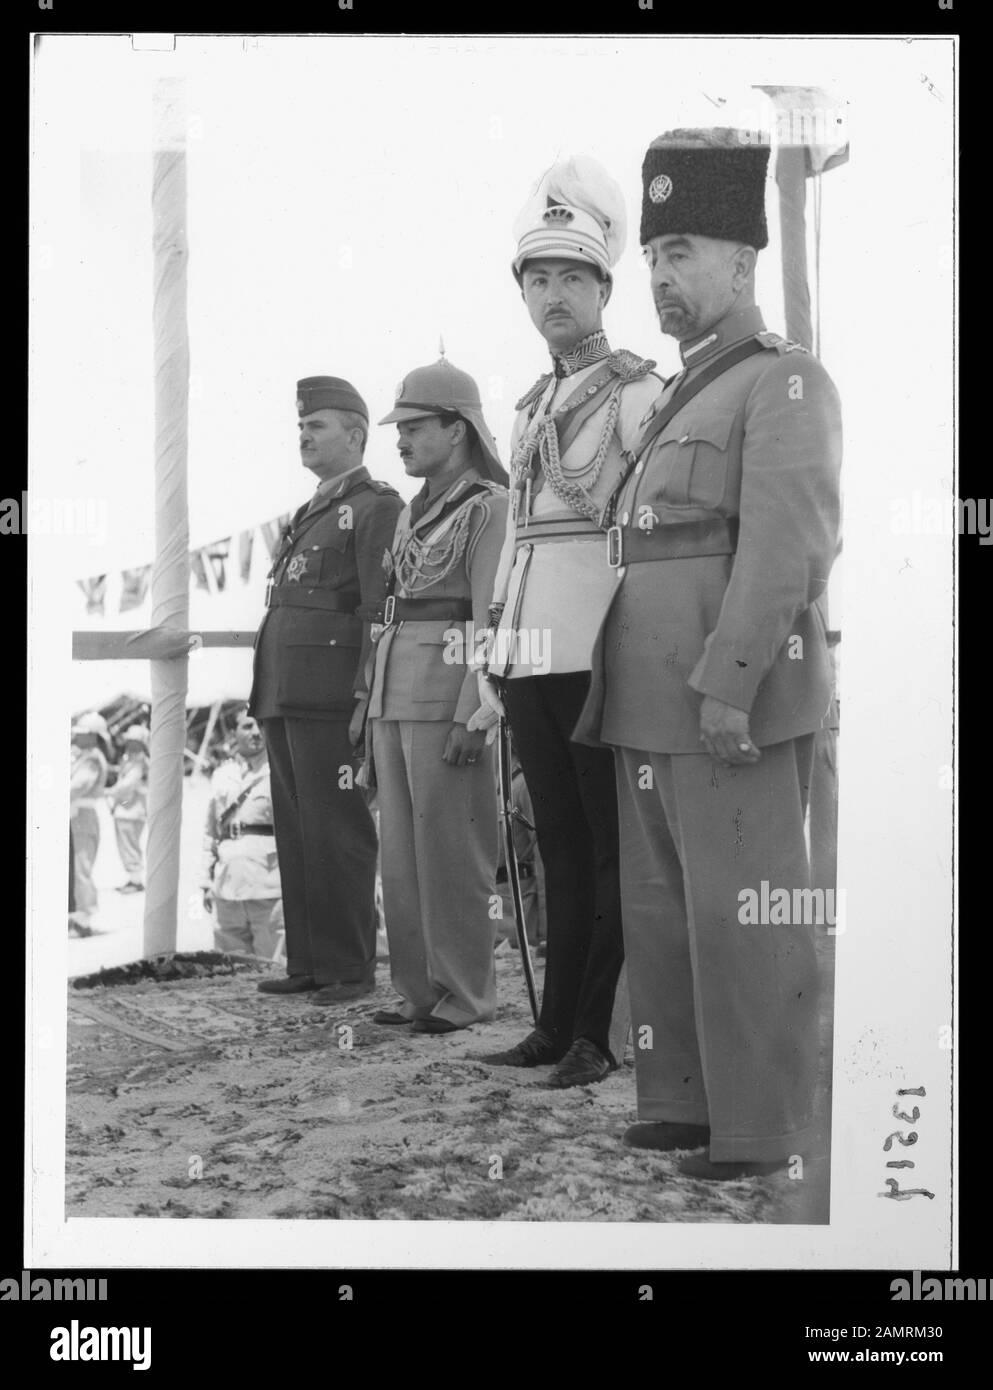 Coronation' of King Abdullah in Amman. King Abdullah, Emir Abdul Illah, (Regent of Iraq), Emir Naif, (King Abdullah's youngest son) and Nuri Pasha Said, Iraqi ambassador at large Abstract/medium: G. Eric and Edith Matson Photograph Collection  Physical description: 1 transparency:; 1946;  Catalog: https://www..gov/pictures/collection/matpc/item/mpc2005010233/PP Original url: https://hdl..gov/.pnp/matpc.14989; Matson Collection; Stock Photo